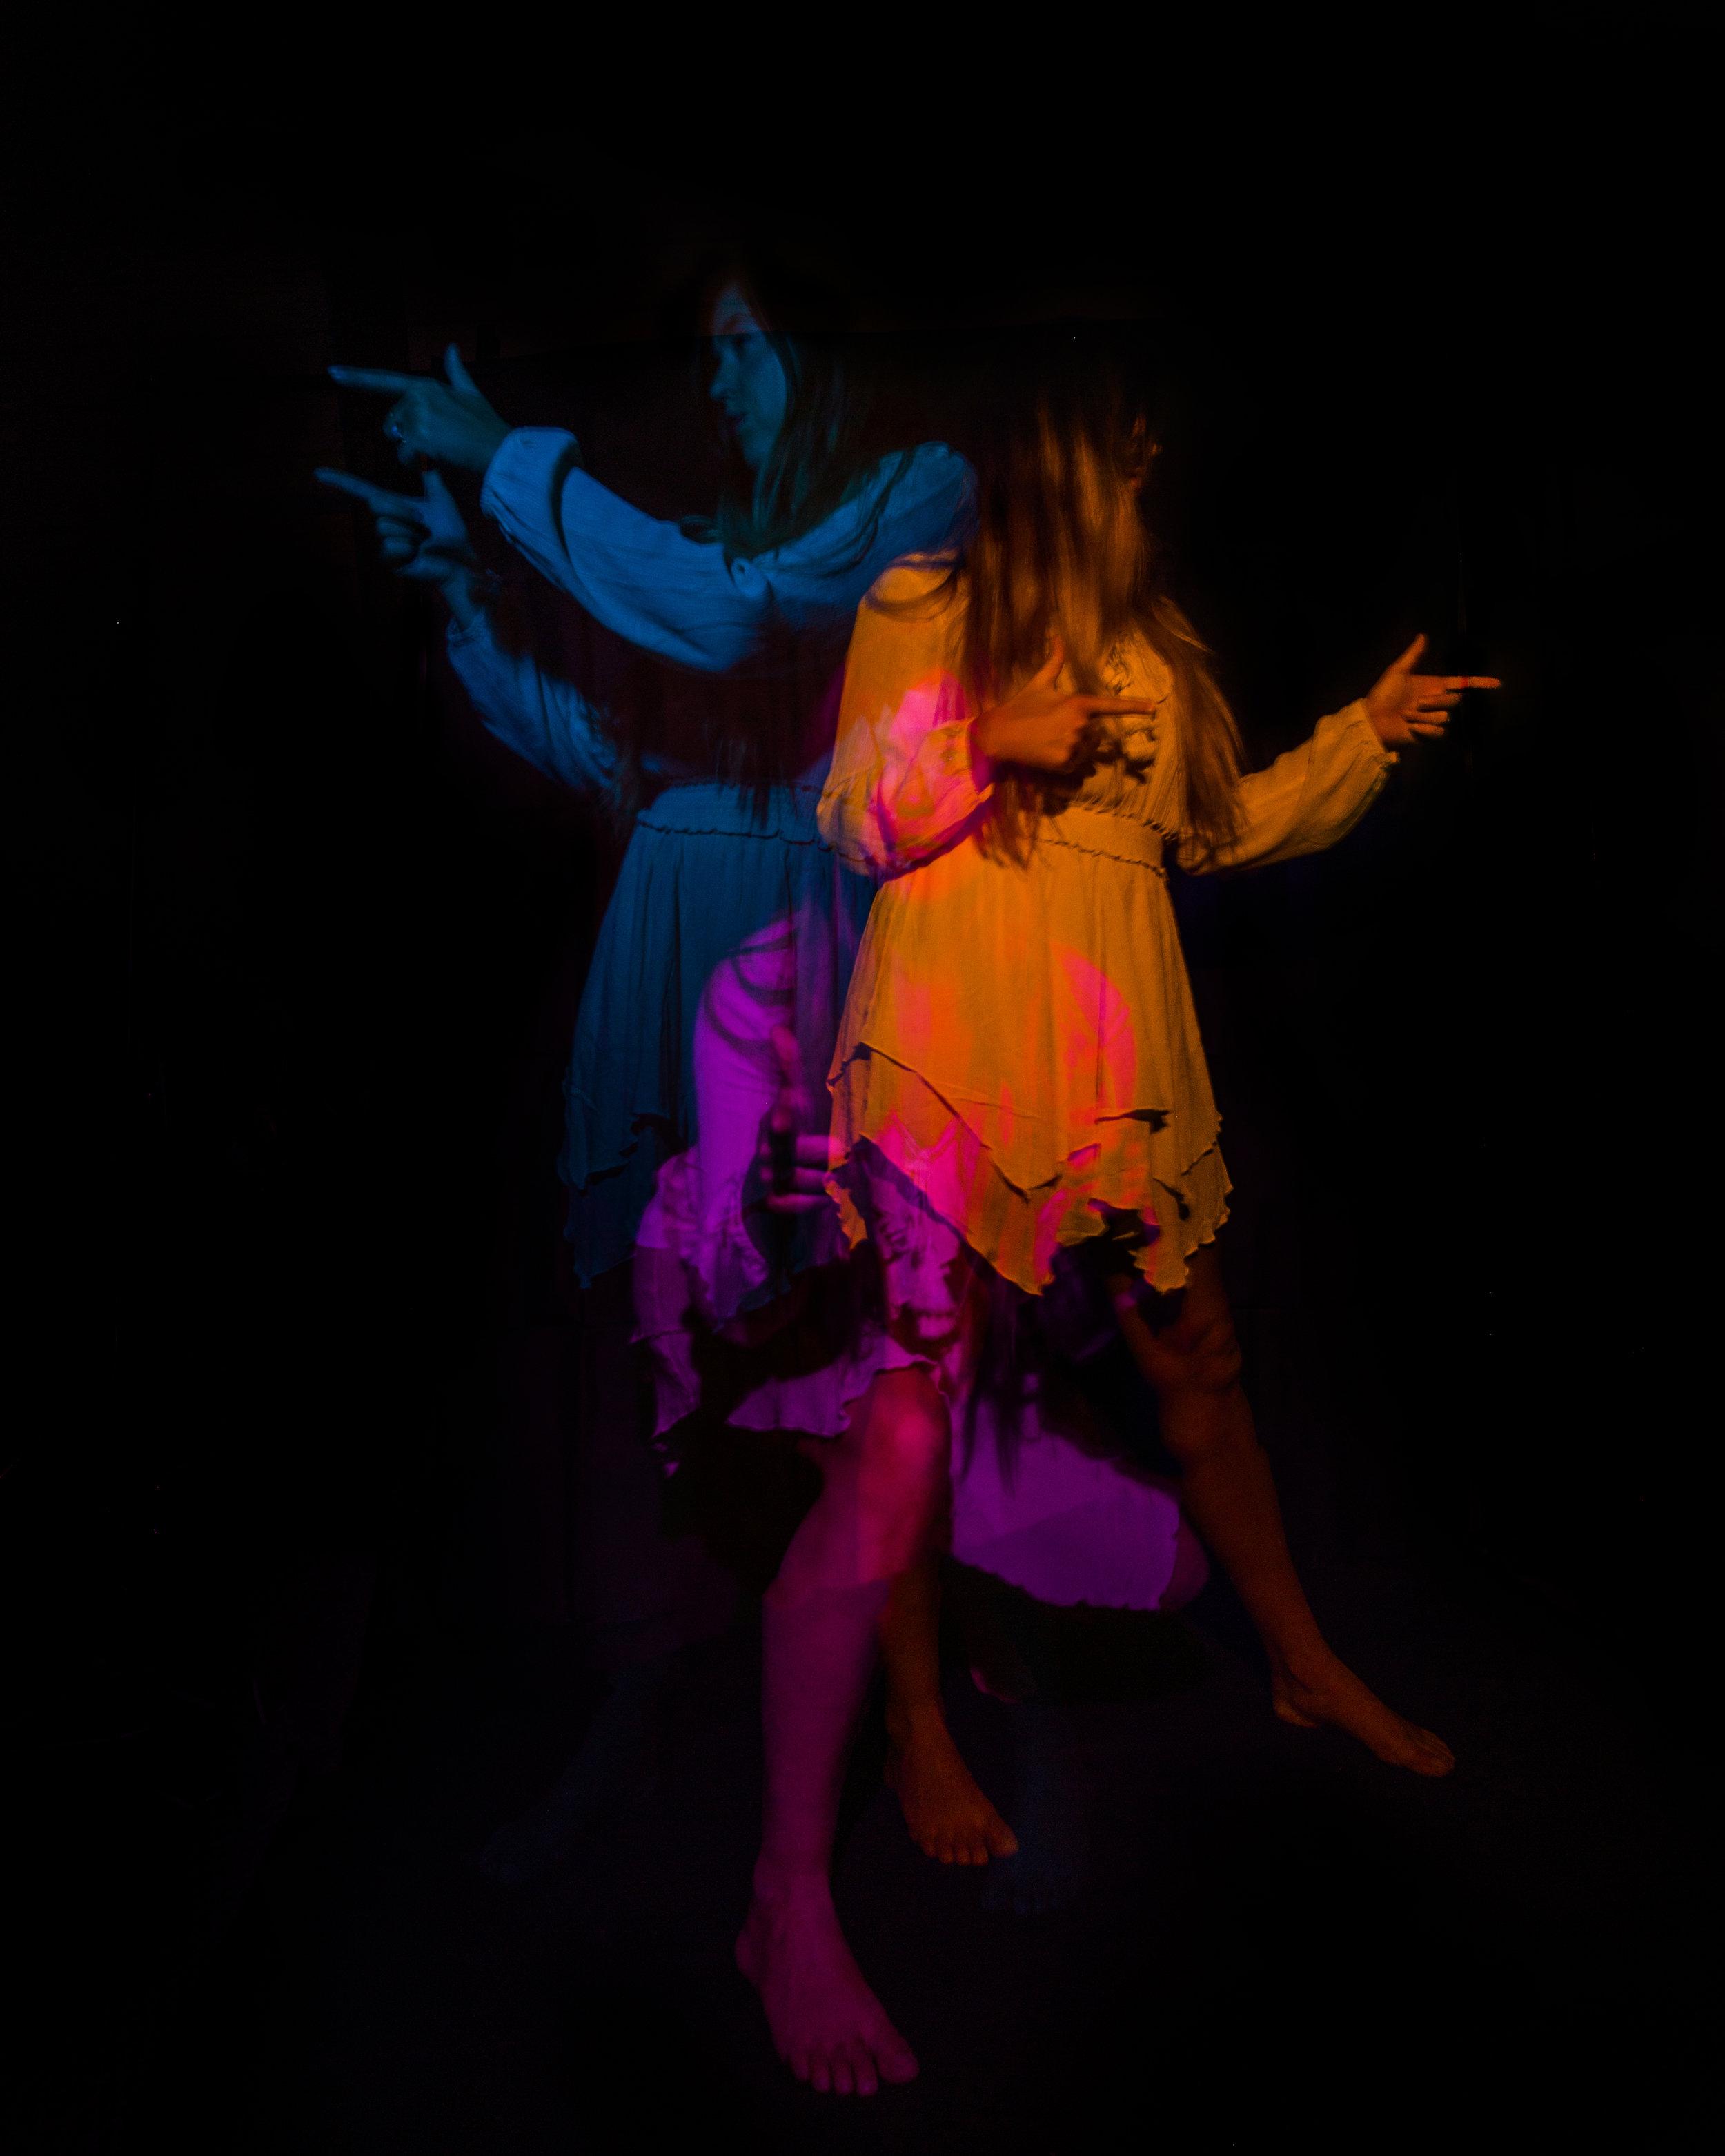 JordanRose_DarrenPearson_AstroBandit_DariusTwin_lightpainting_psychedelic_dancer_4.jpg